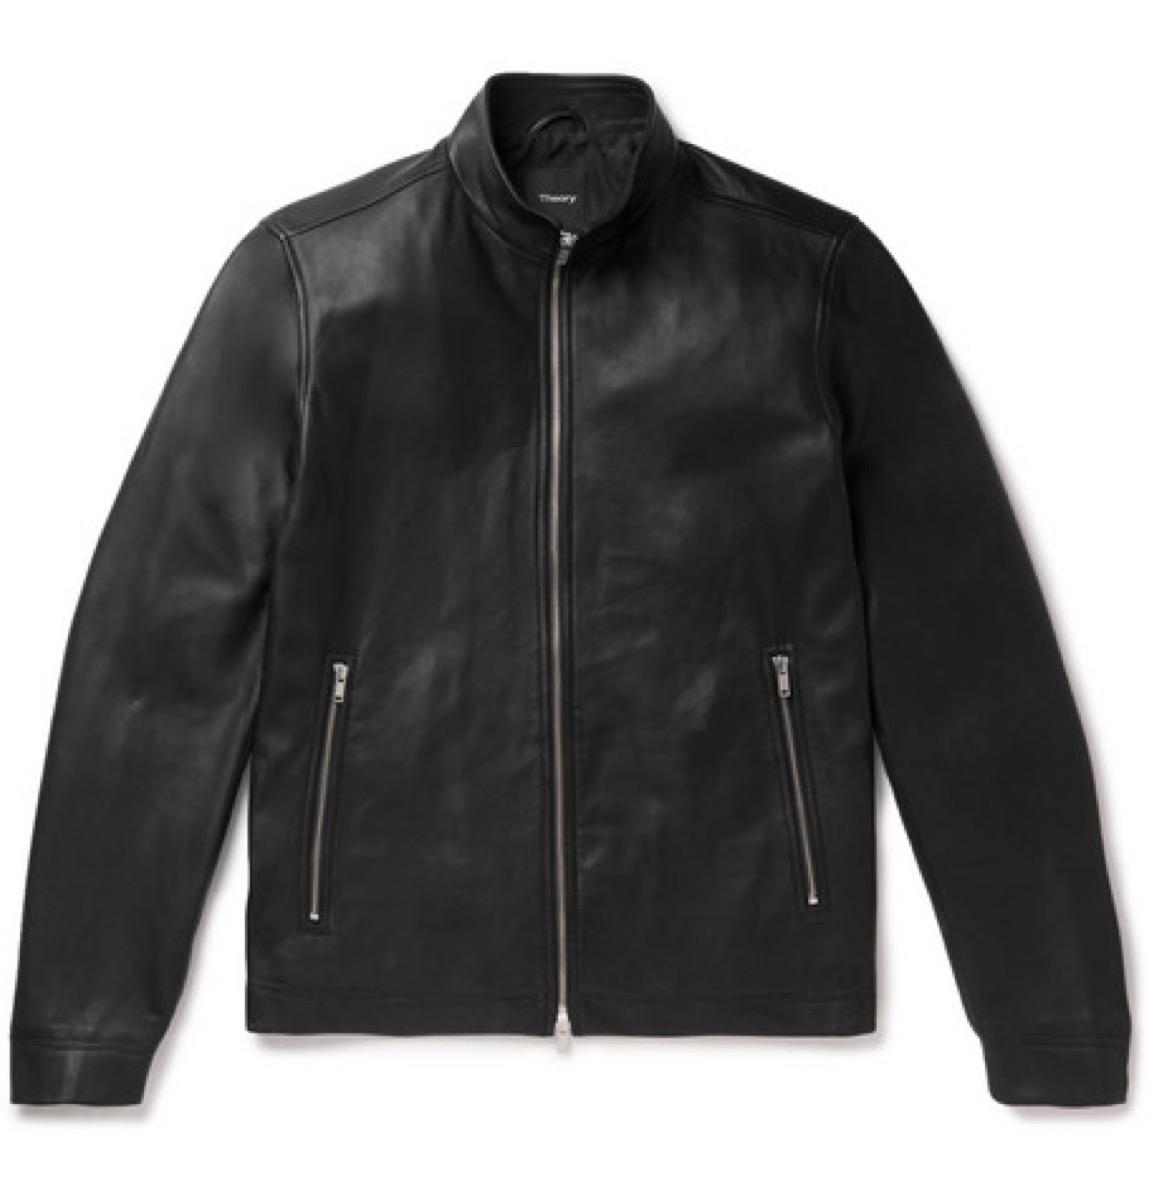 Leather Jacket Mr. Porter Best Birthday Gifts Husband